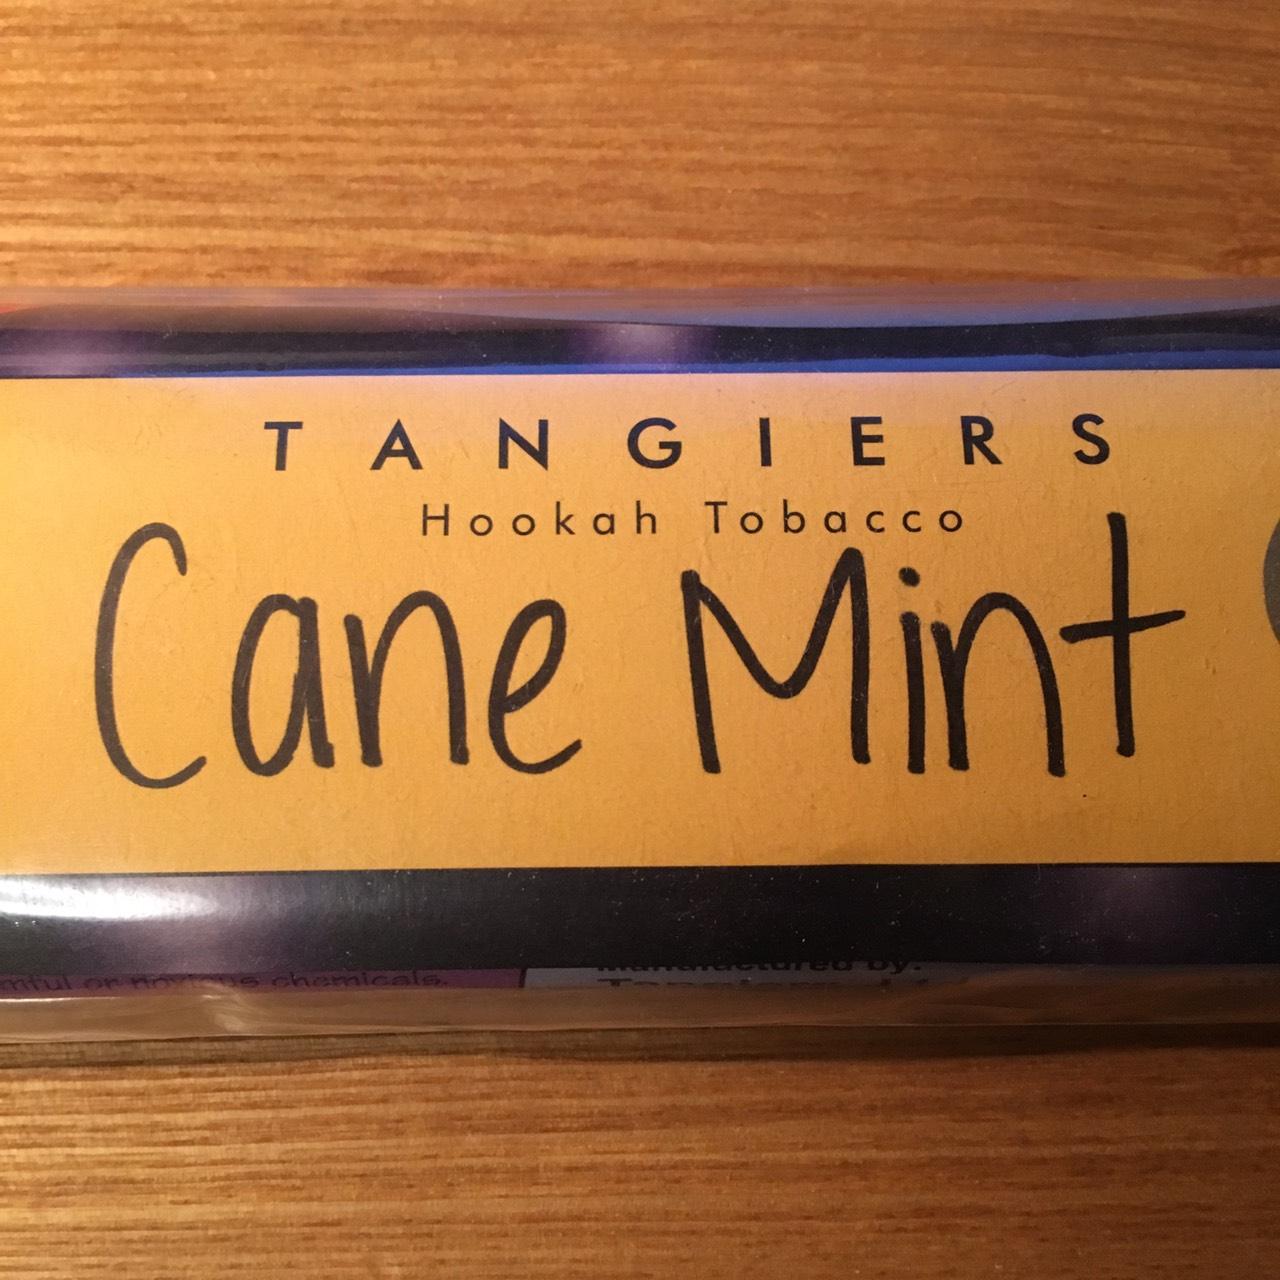 Tangiers Noir / Cane Mint(Tangiersの中で最も売れているフレーバー、美味しい)